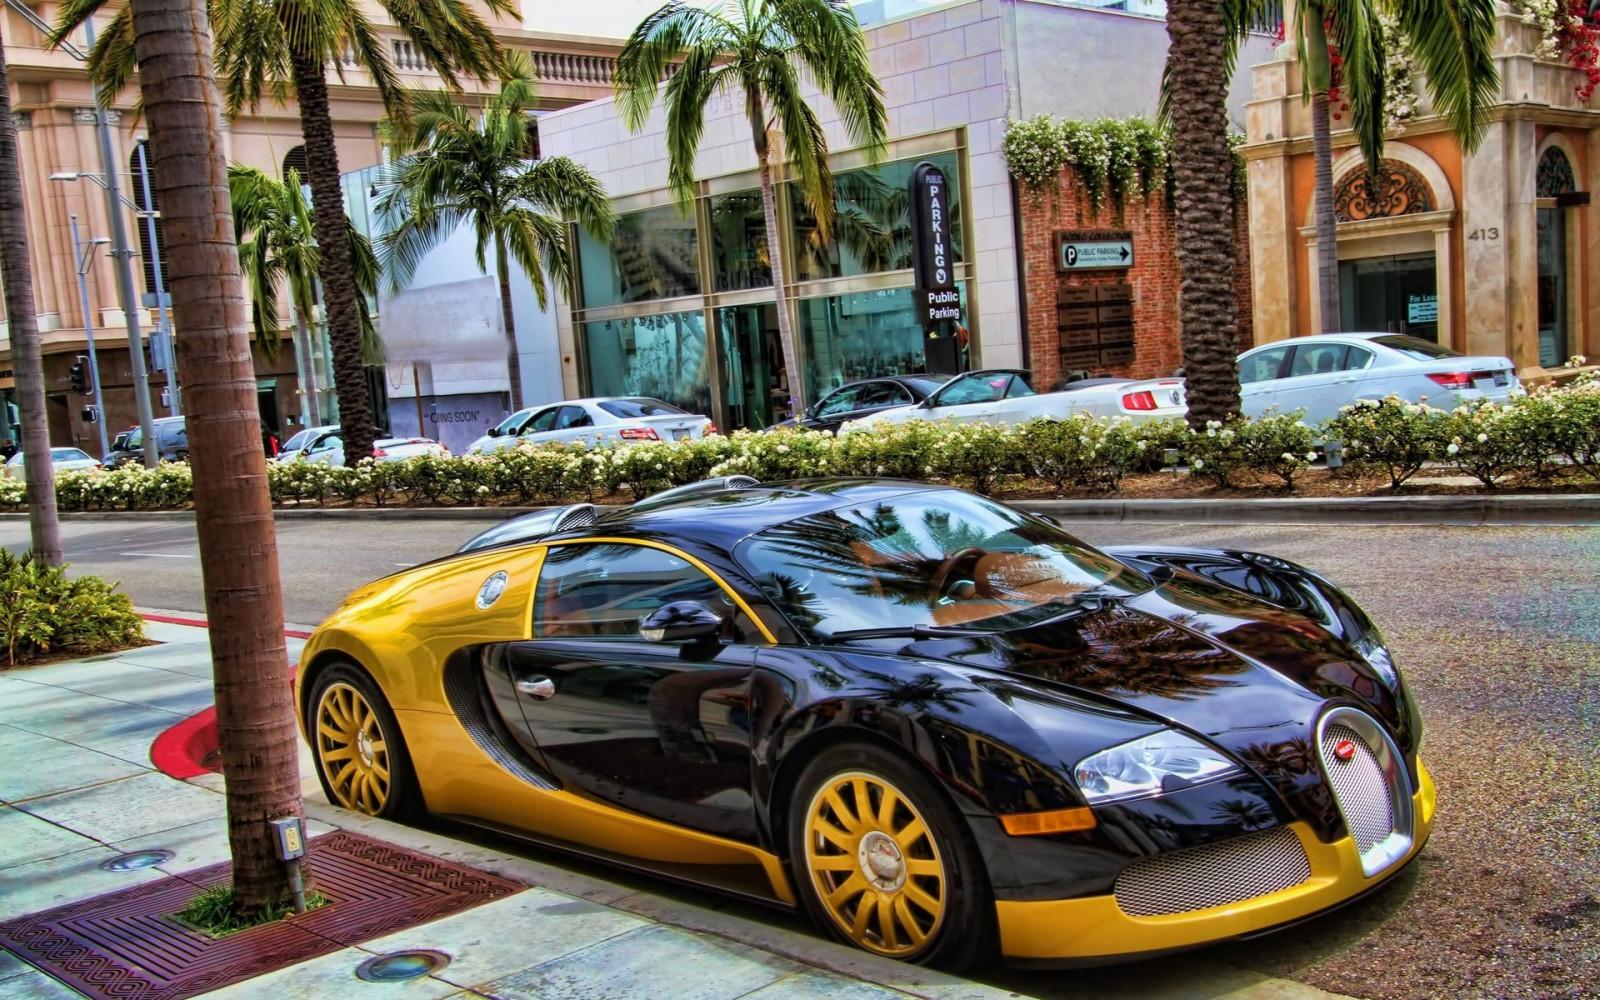 fond d 39 cran v hicule palmiers hdr los angeles super voiture voiture de sport bugatti. Black Bedroom Furniture Sets. Home Design Ideas